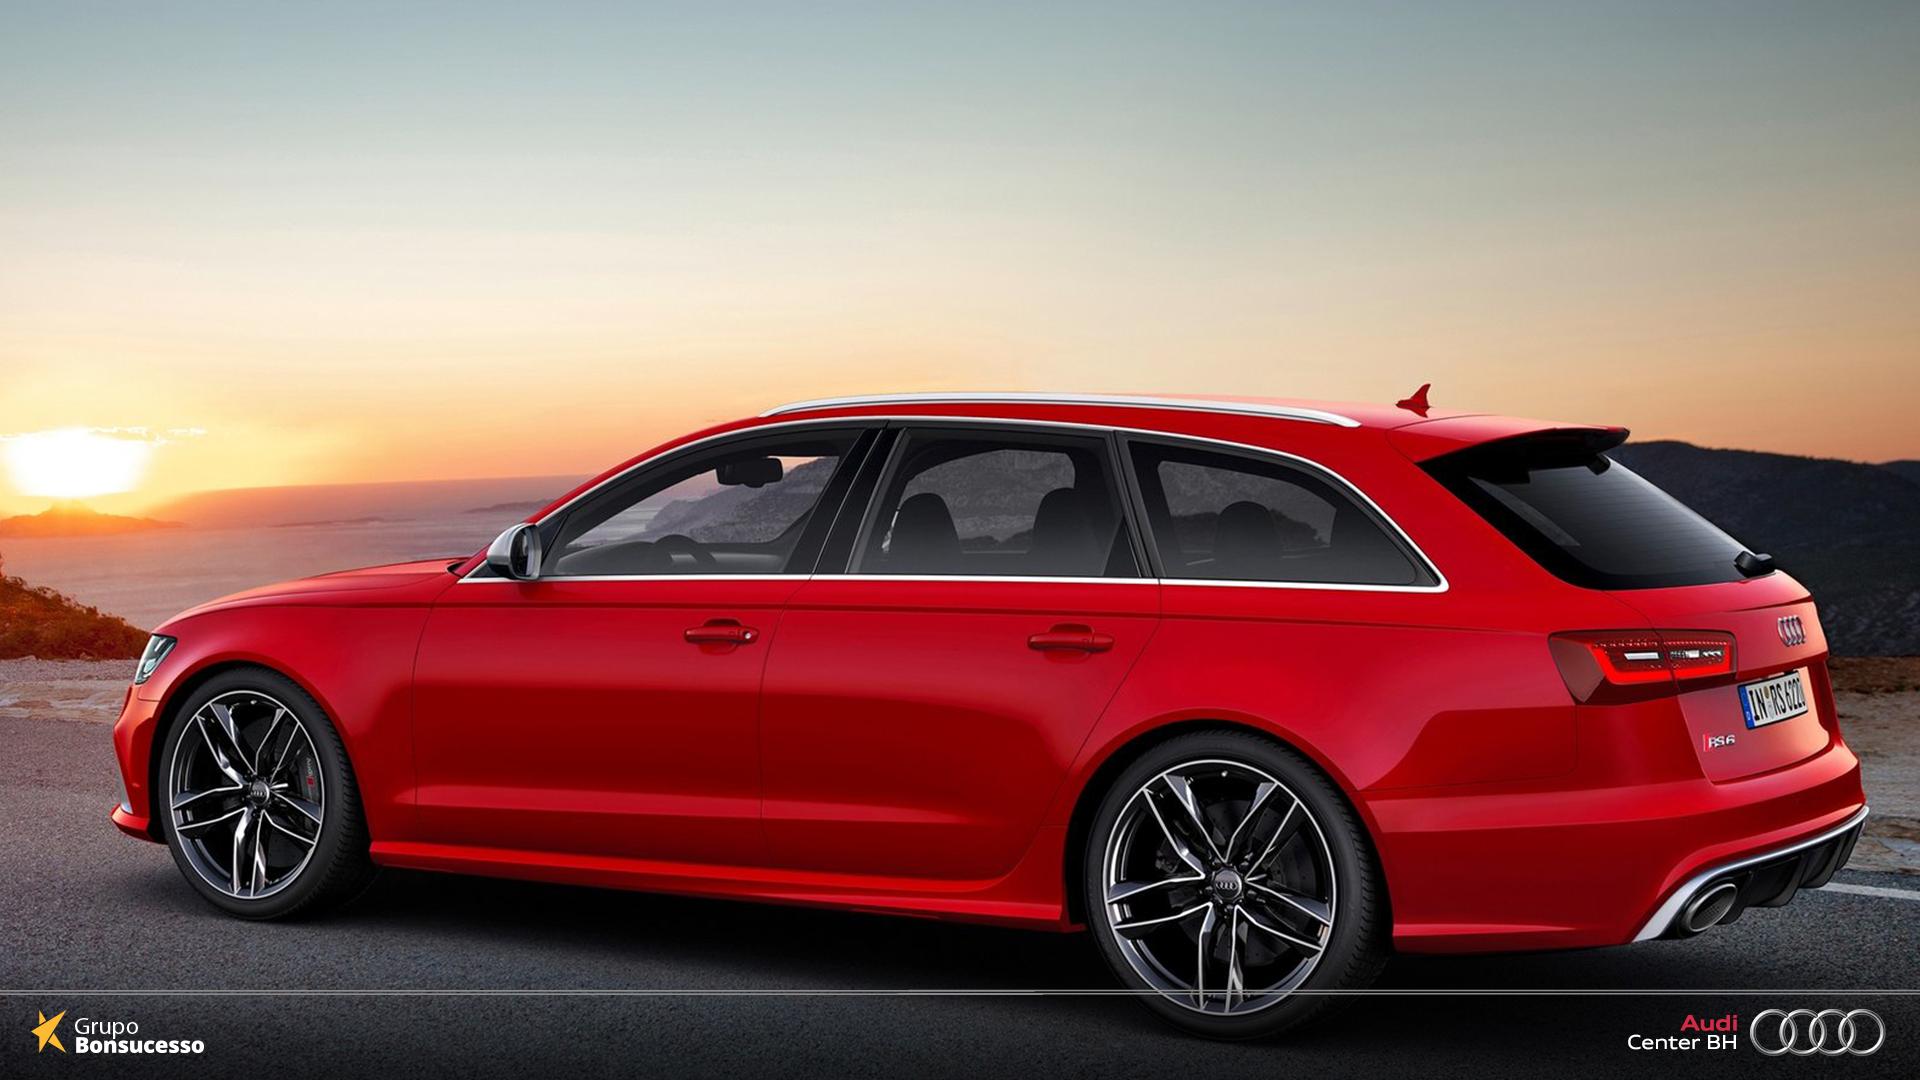 Tecnologia, potência e elegância. Audi RS 6 Avant,um carro único.  #Audi #AudiLovers #Love #AudiAutomóvel #AudiCenterBH #AudiRS6Avant#RS6 #RS6Avant